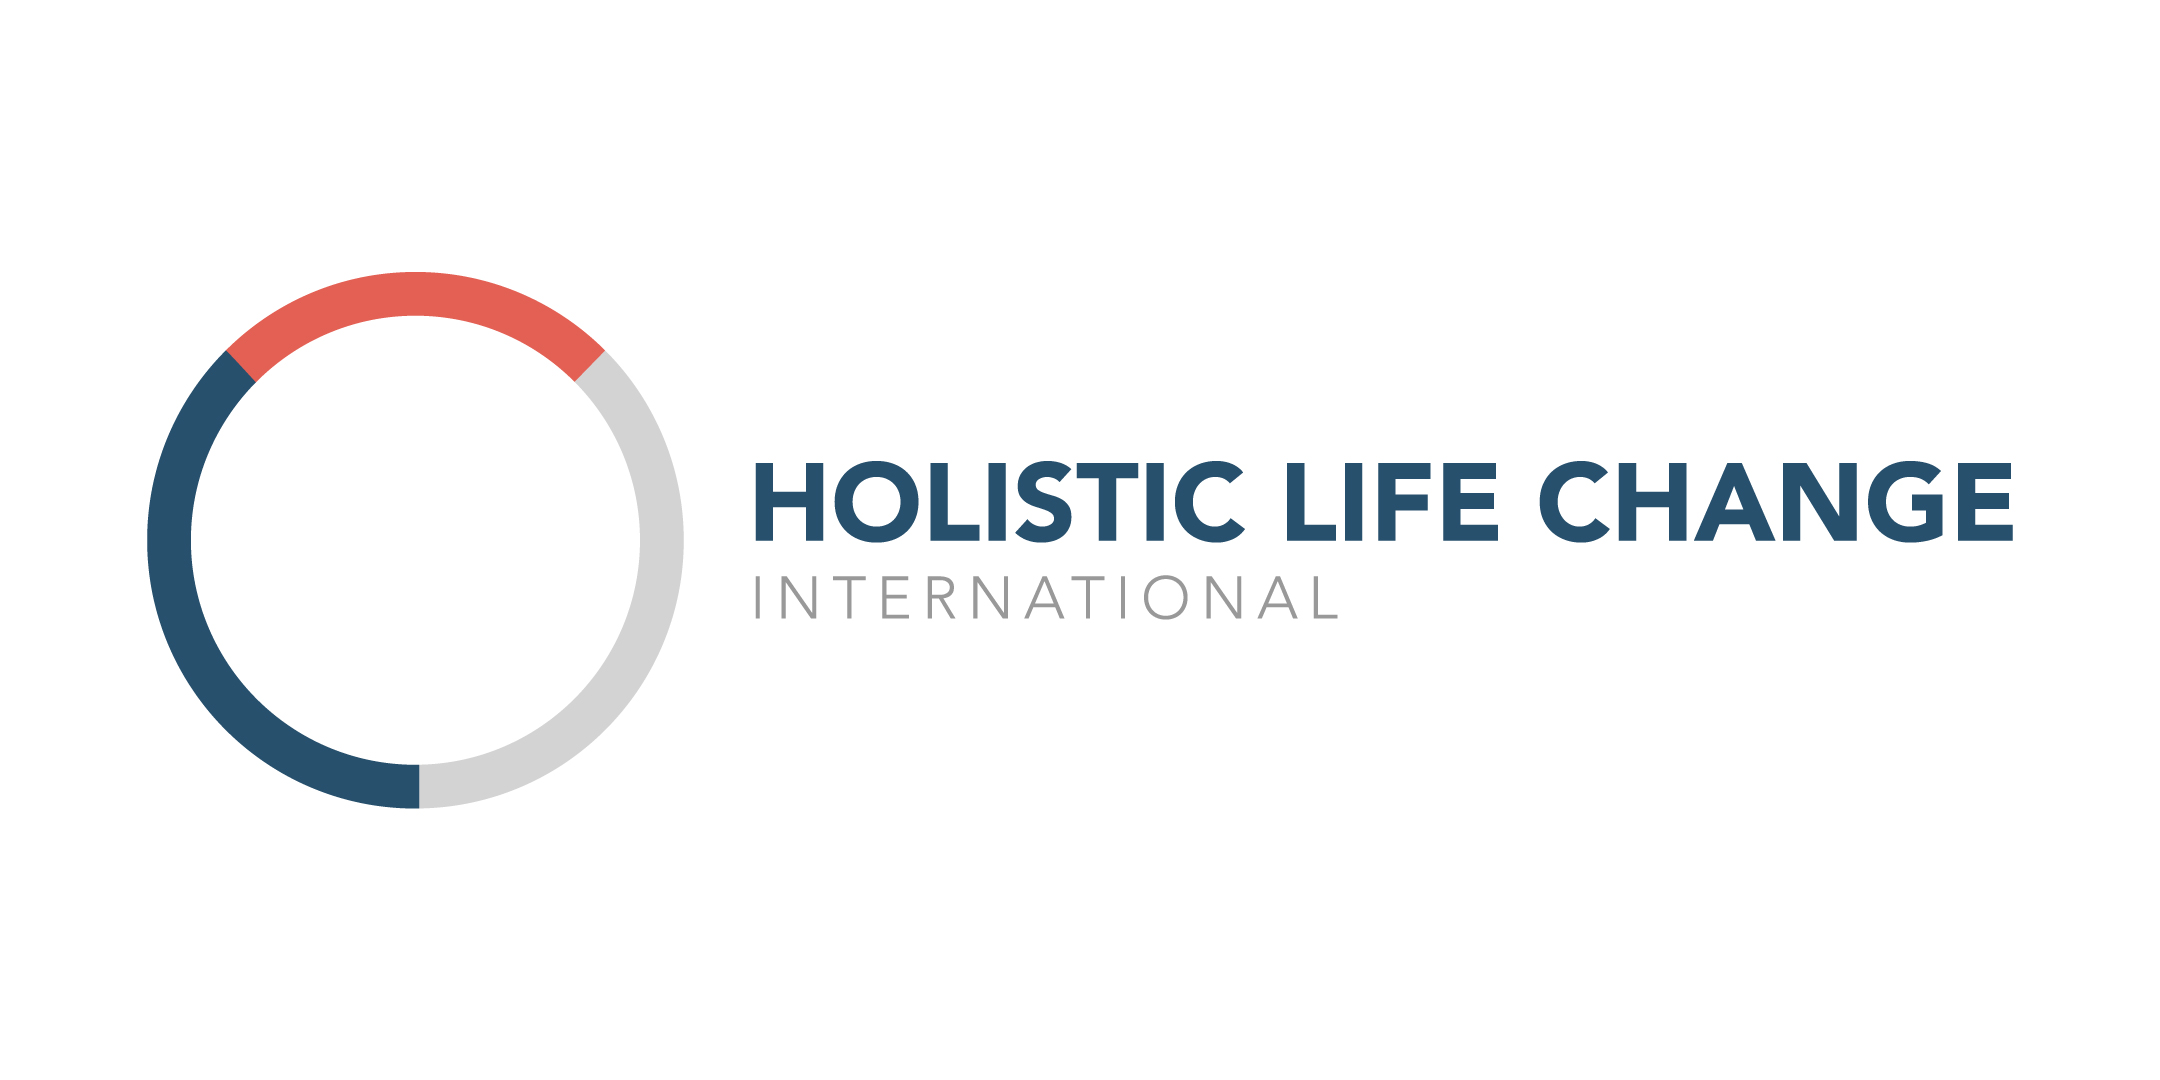 Holistic-LIfe-Change-Logo_EventBrite.jpg